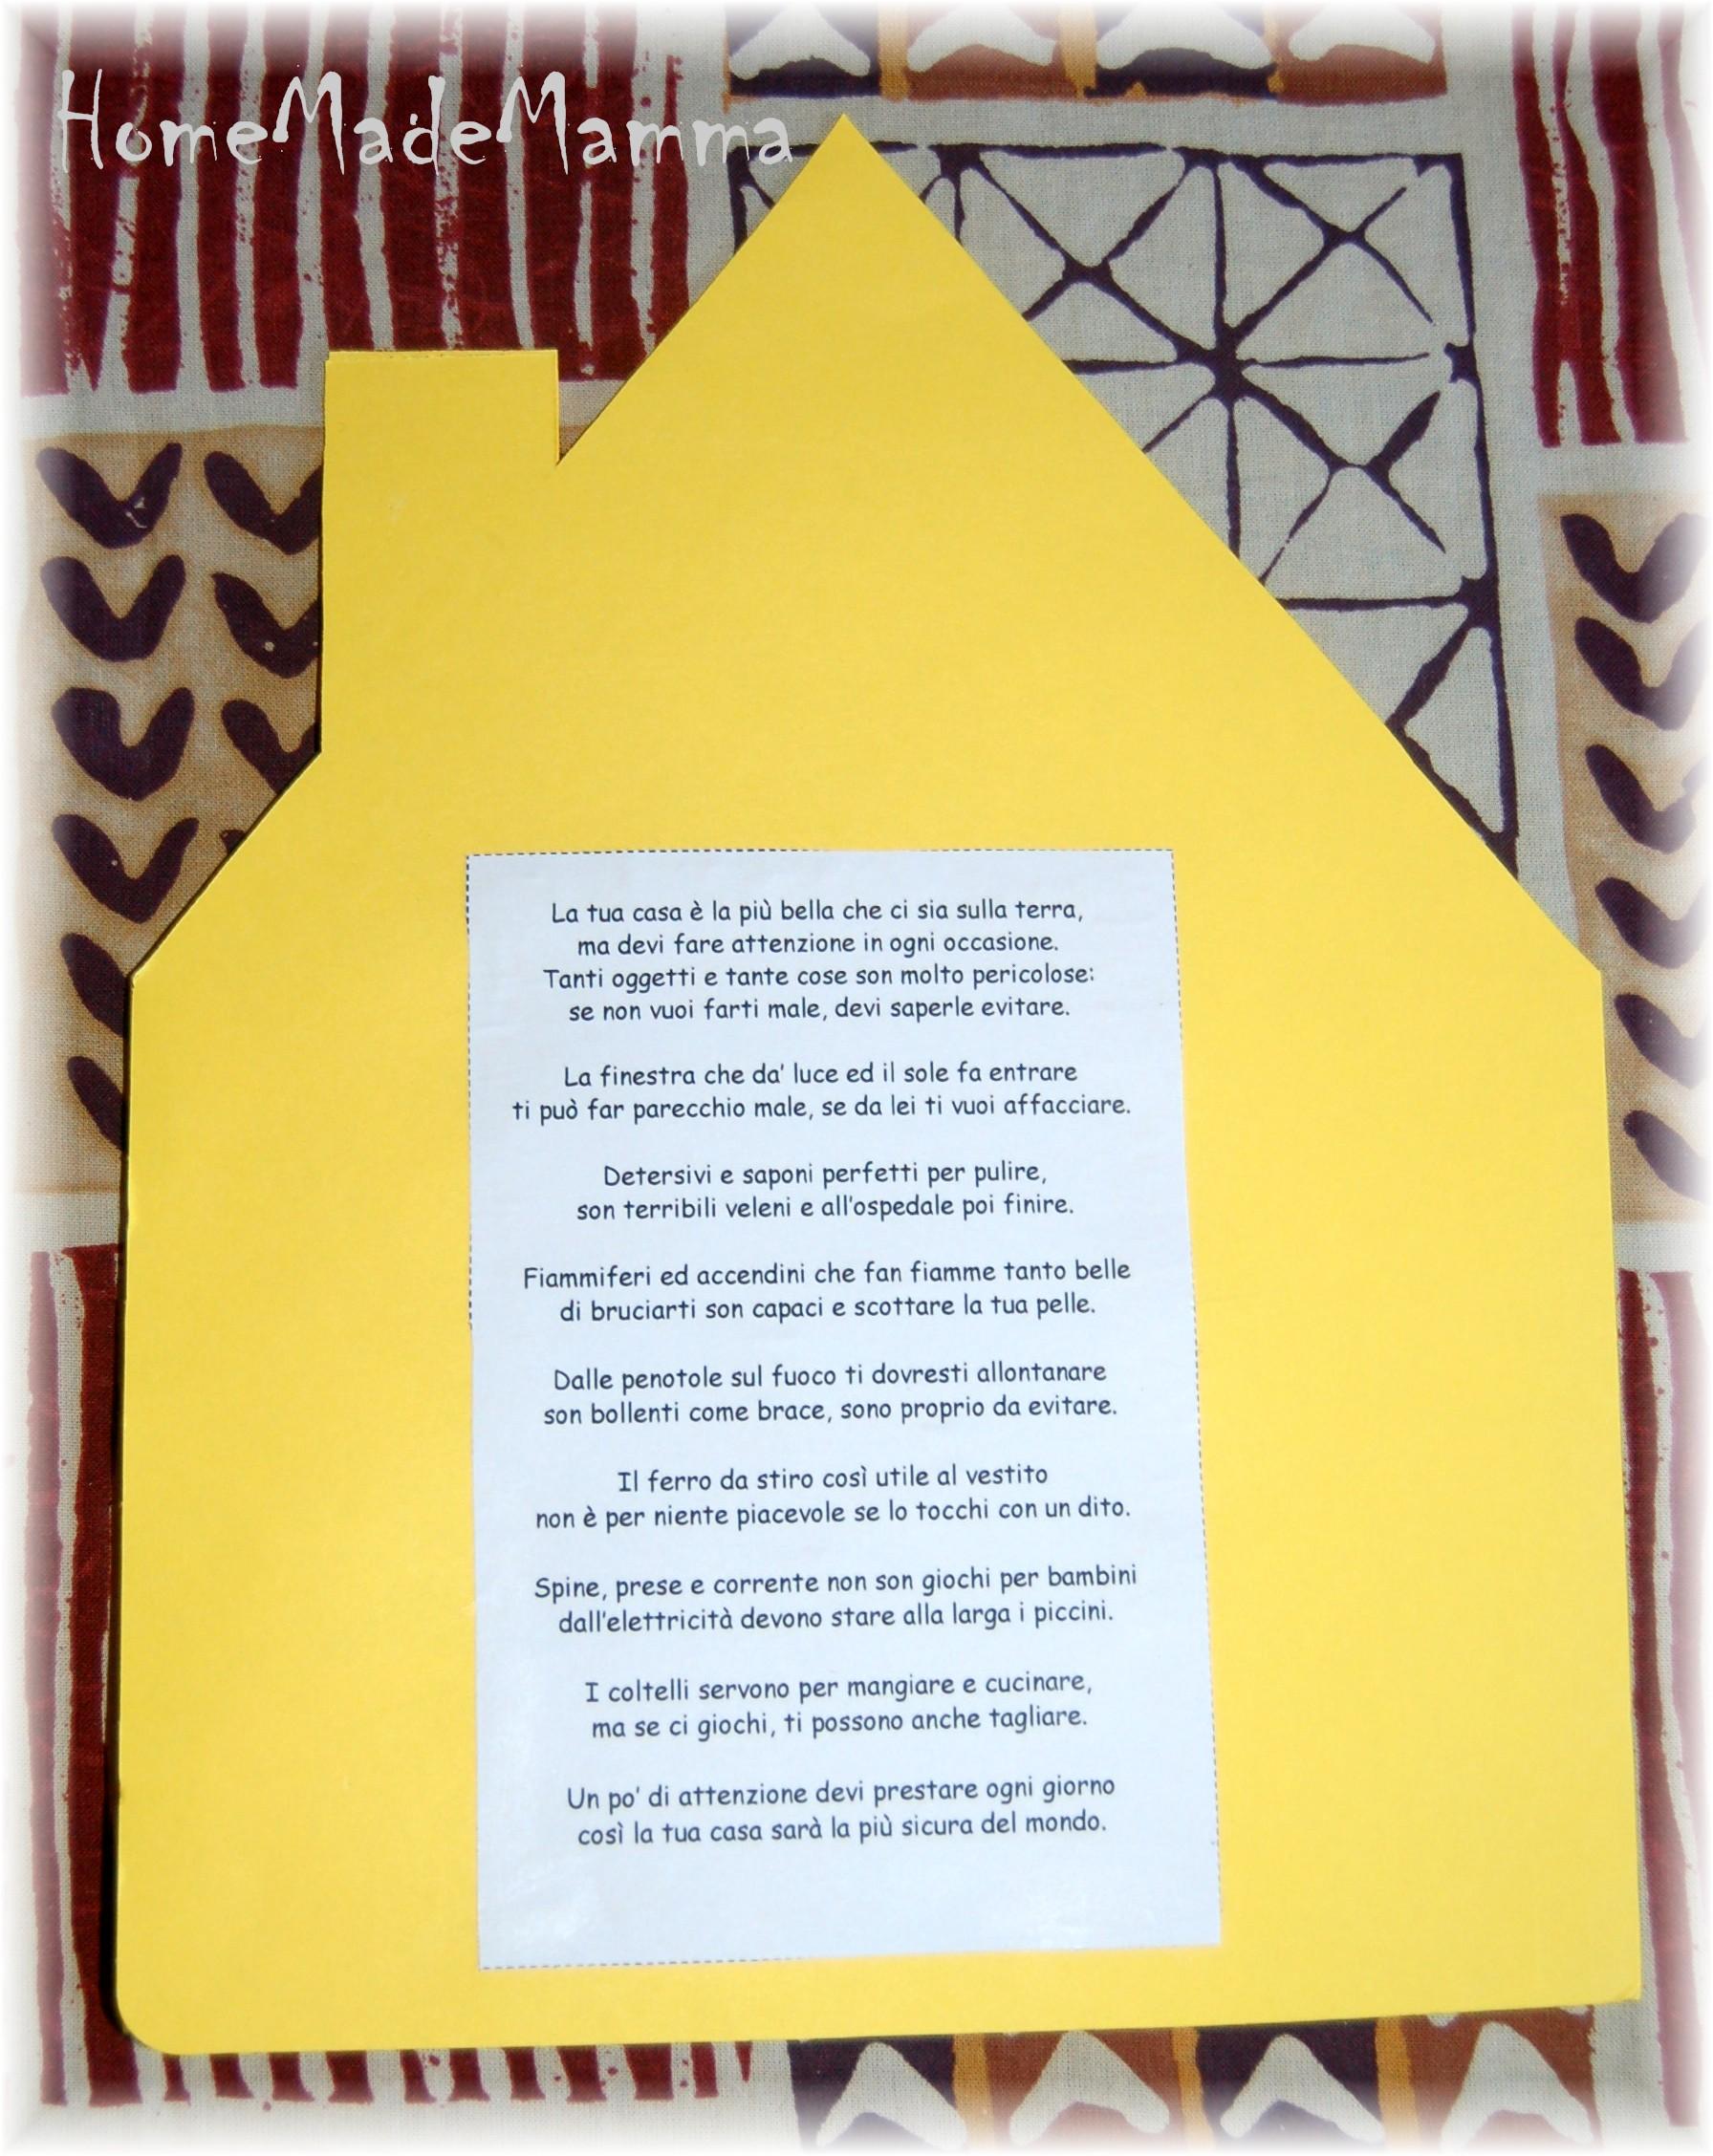 Illuminazione di emergenza per una casa sicura tutto su for Layout di una casa di una storia